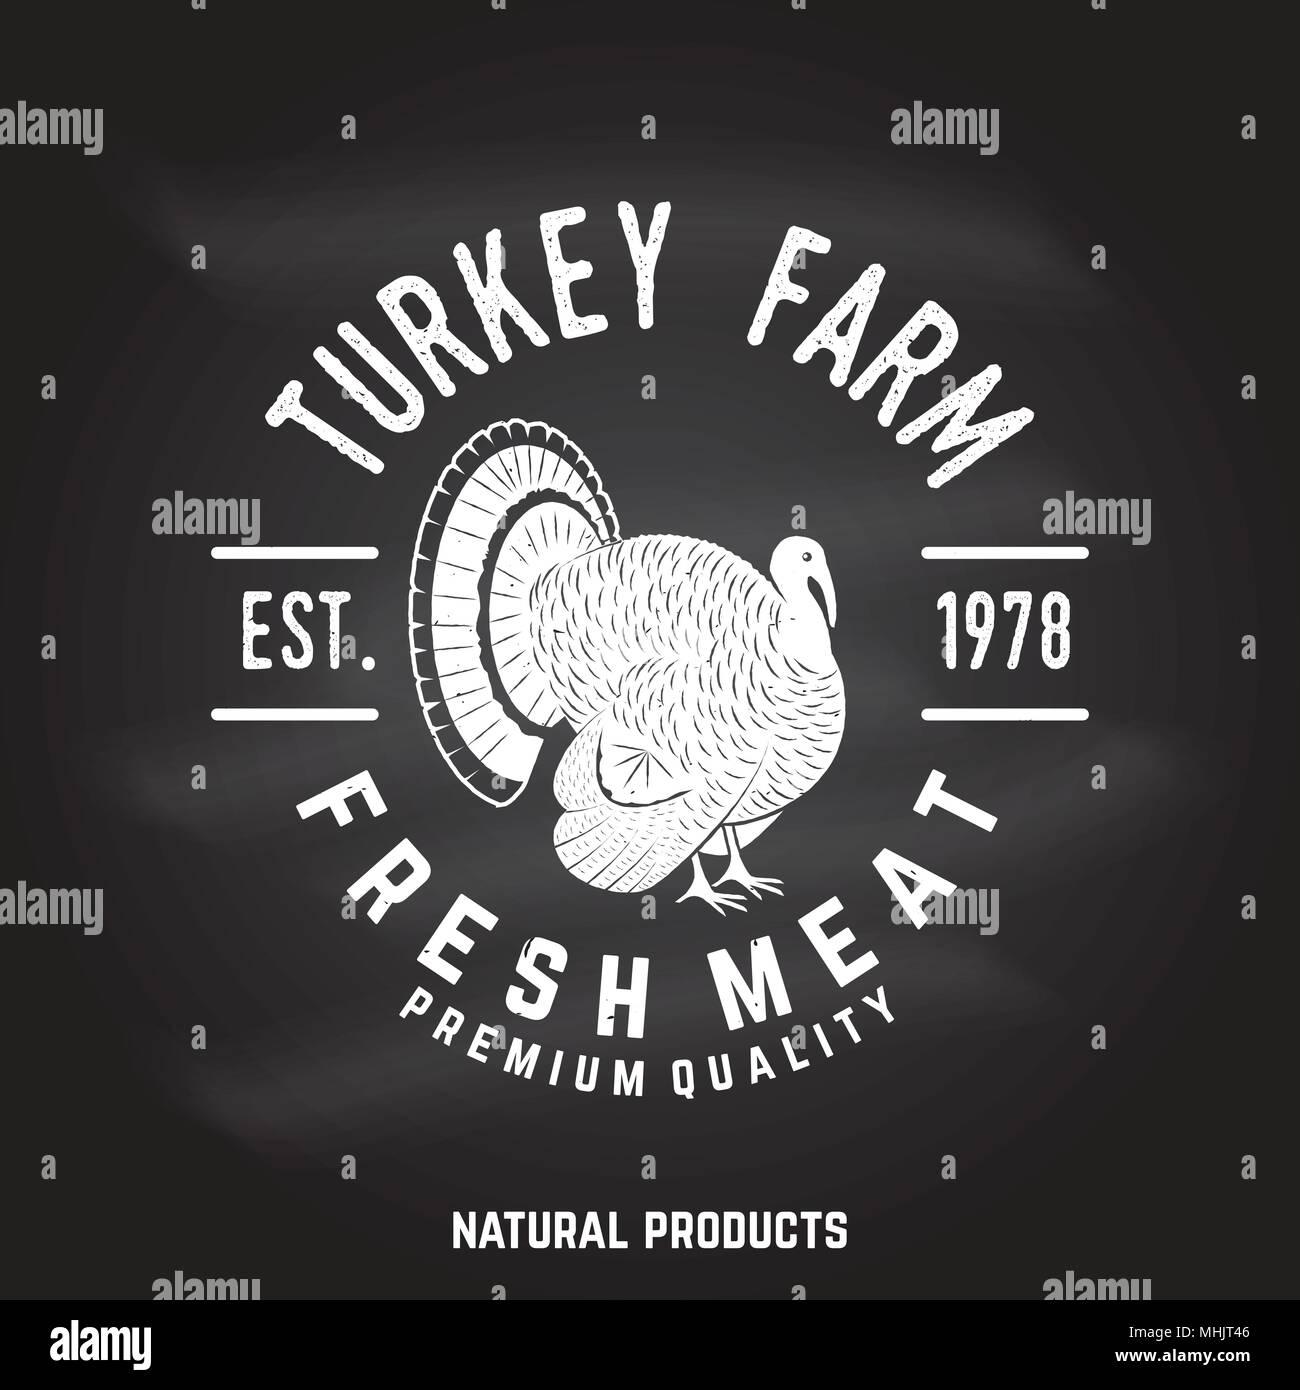 Turkey Farm Badge or Label. - Stock Vector